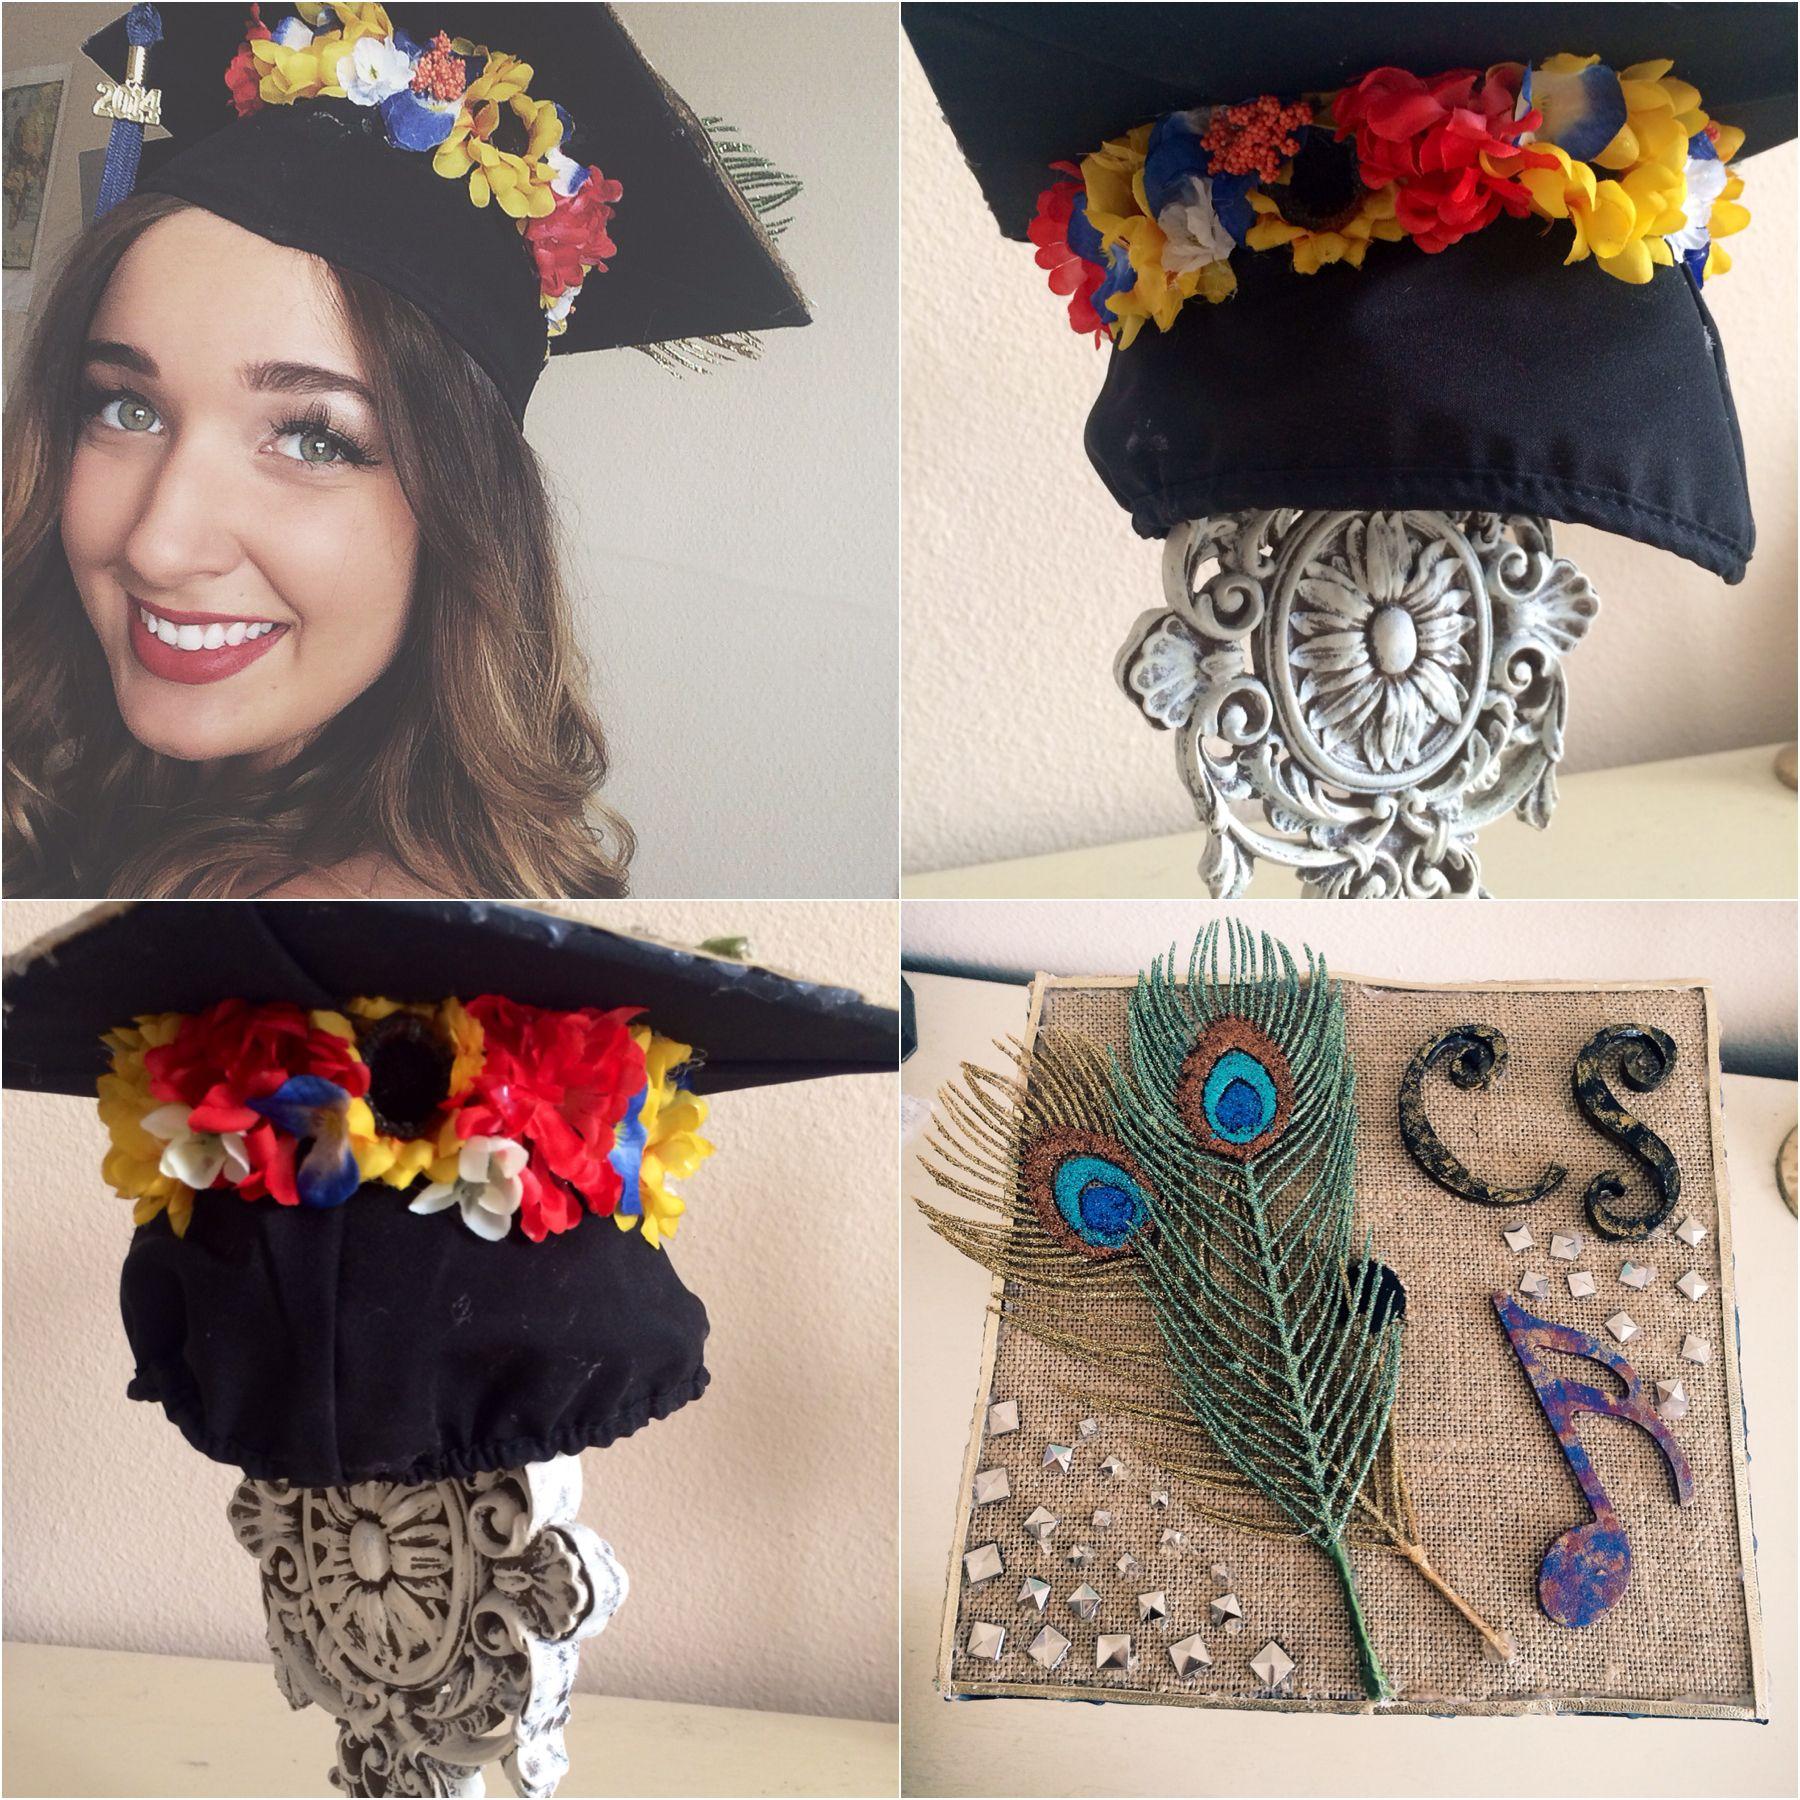 Flower Crown Graduation Cap Graduation Cap Pinterest Flower